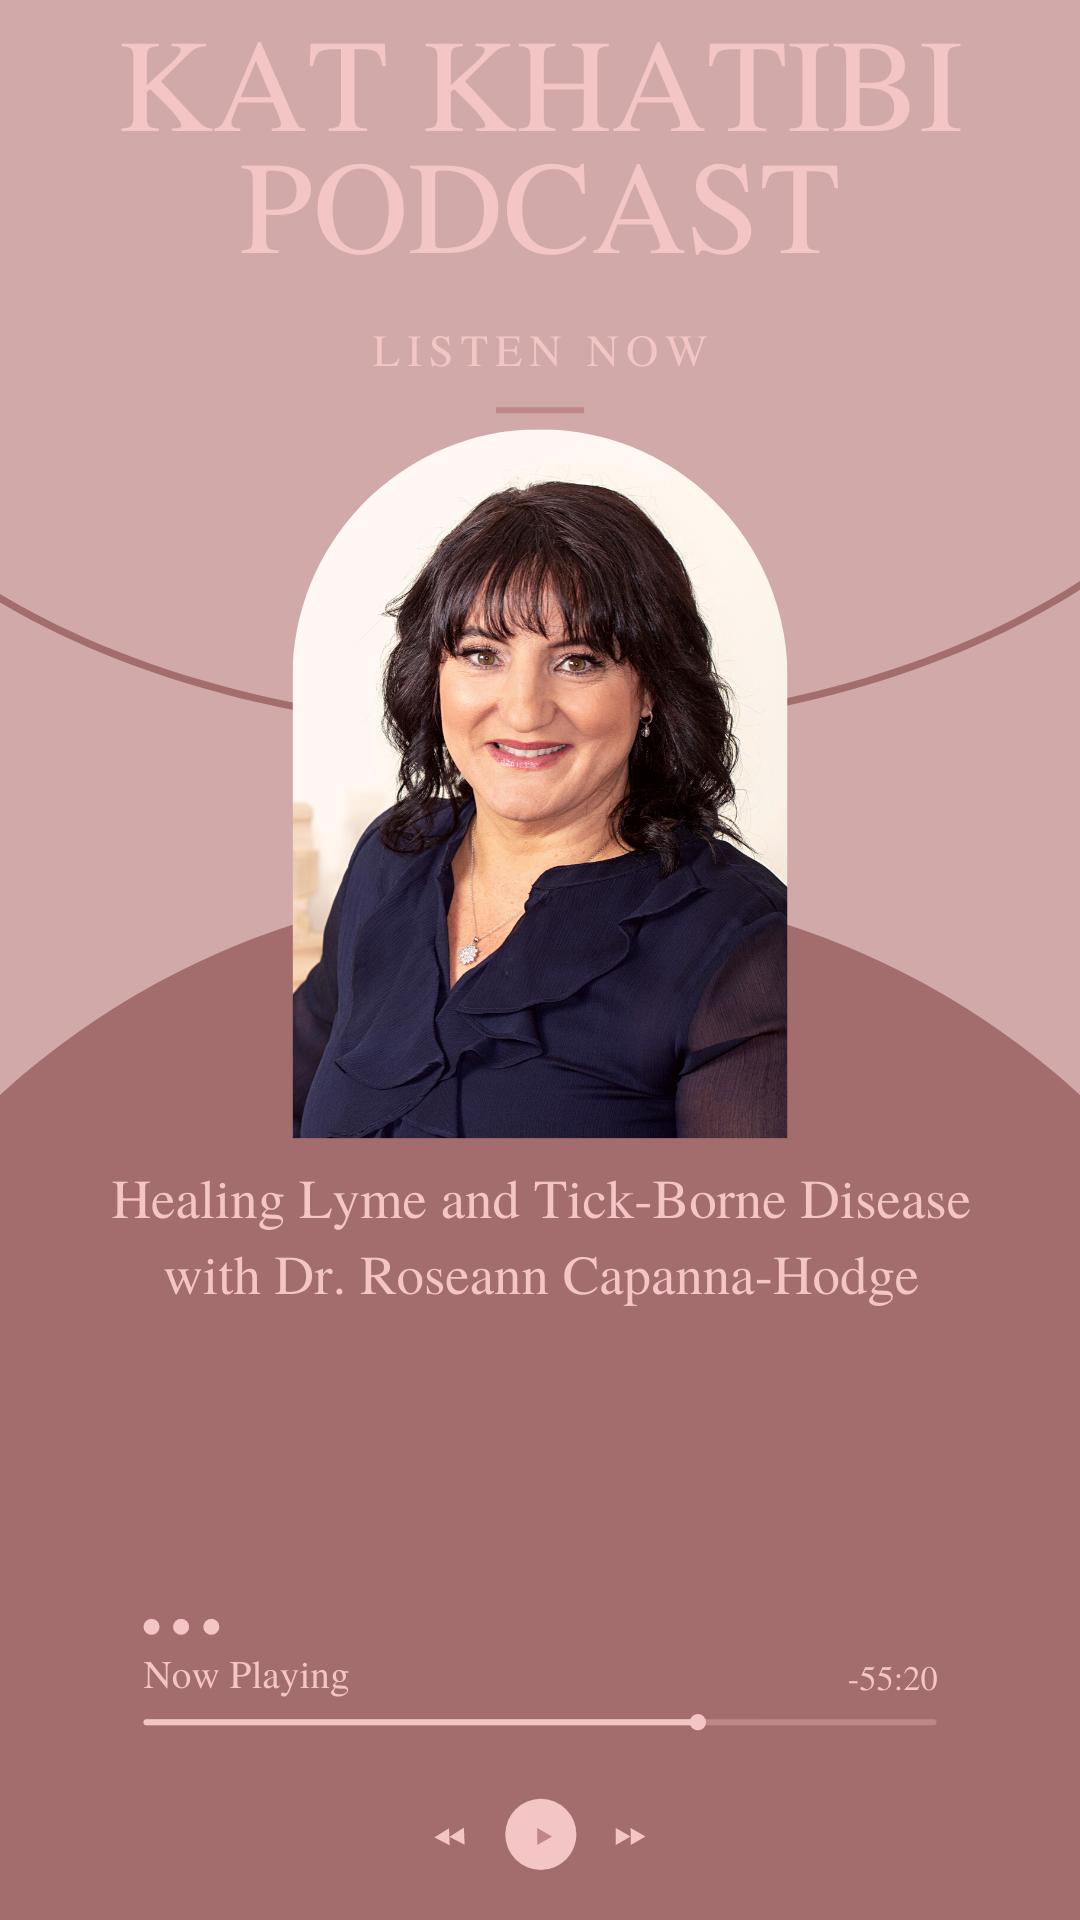 Healing Lyme and Tick-Borne Disease with Dr. Roseann Capanna-Hodge